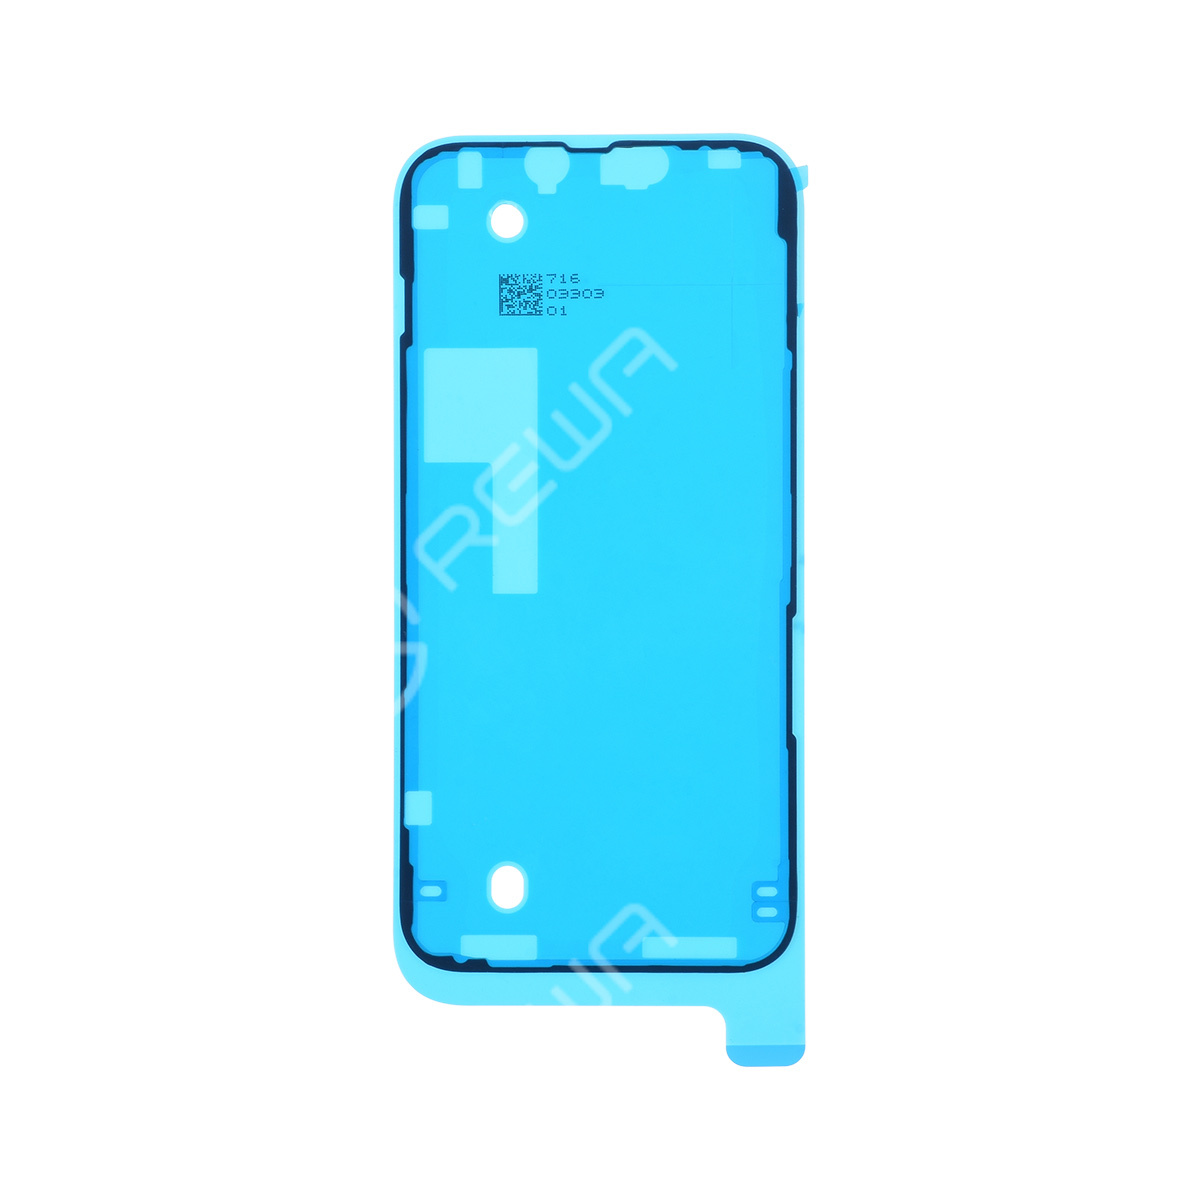 For Apple iPhone 13/13 mini/13 Pro/13 Pro Max Screen Repair Tape Waterproof Seal Sticker Replacement